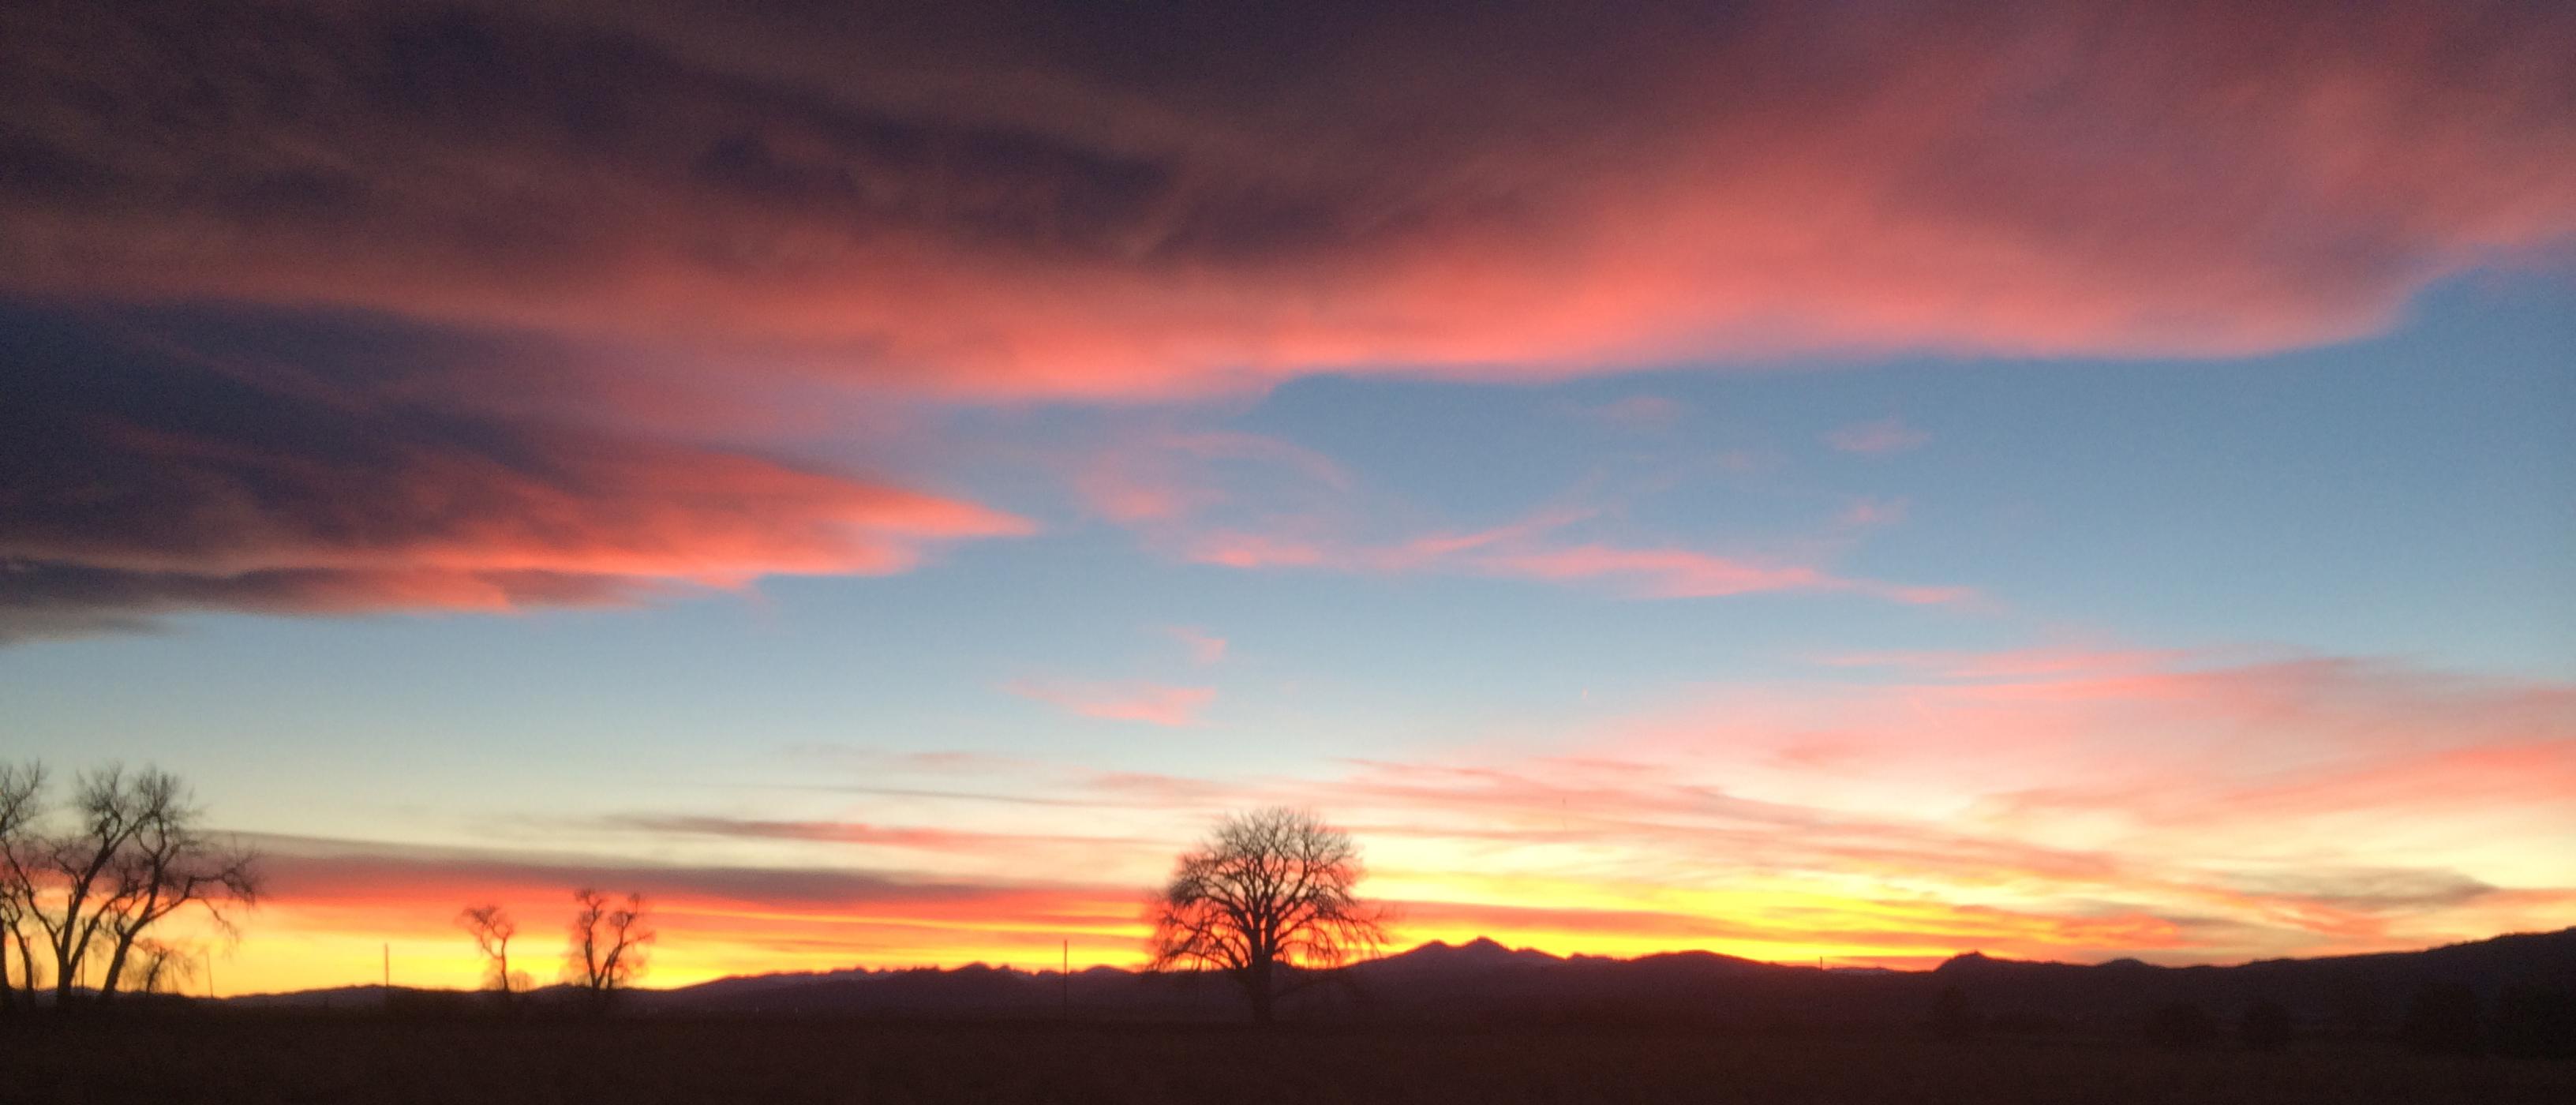 sunset-11-28-14